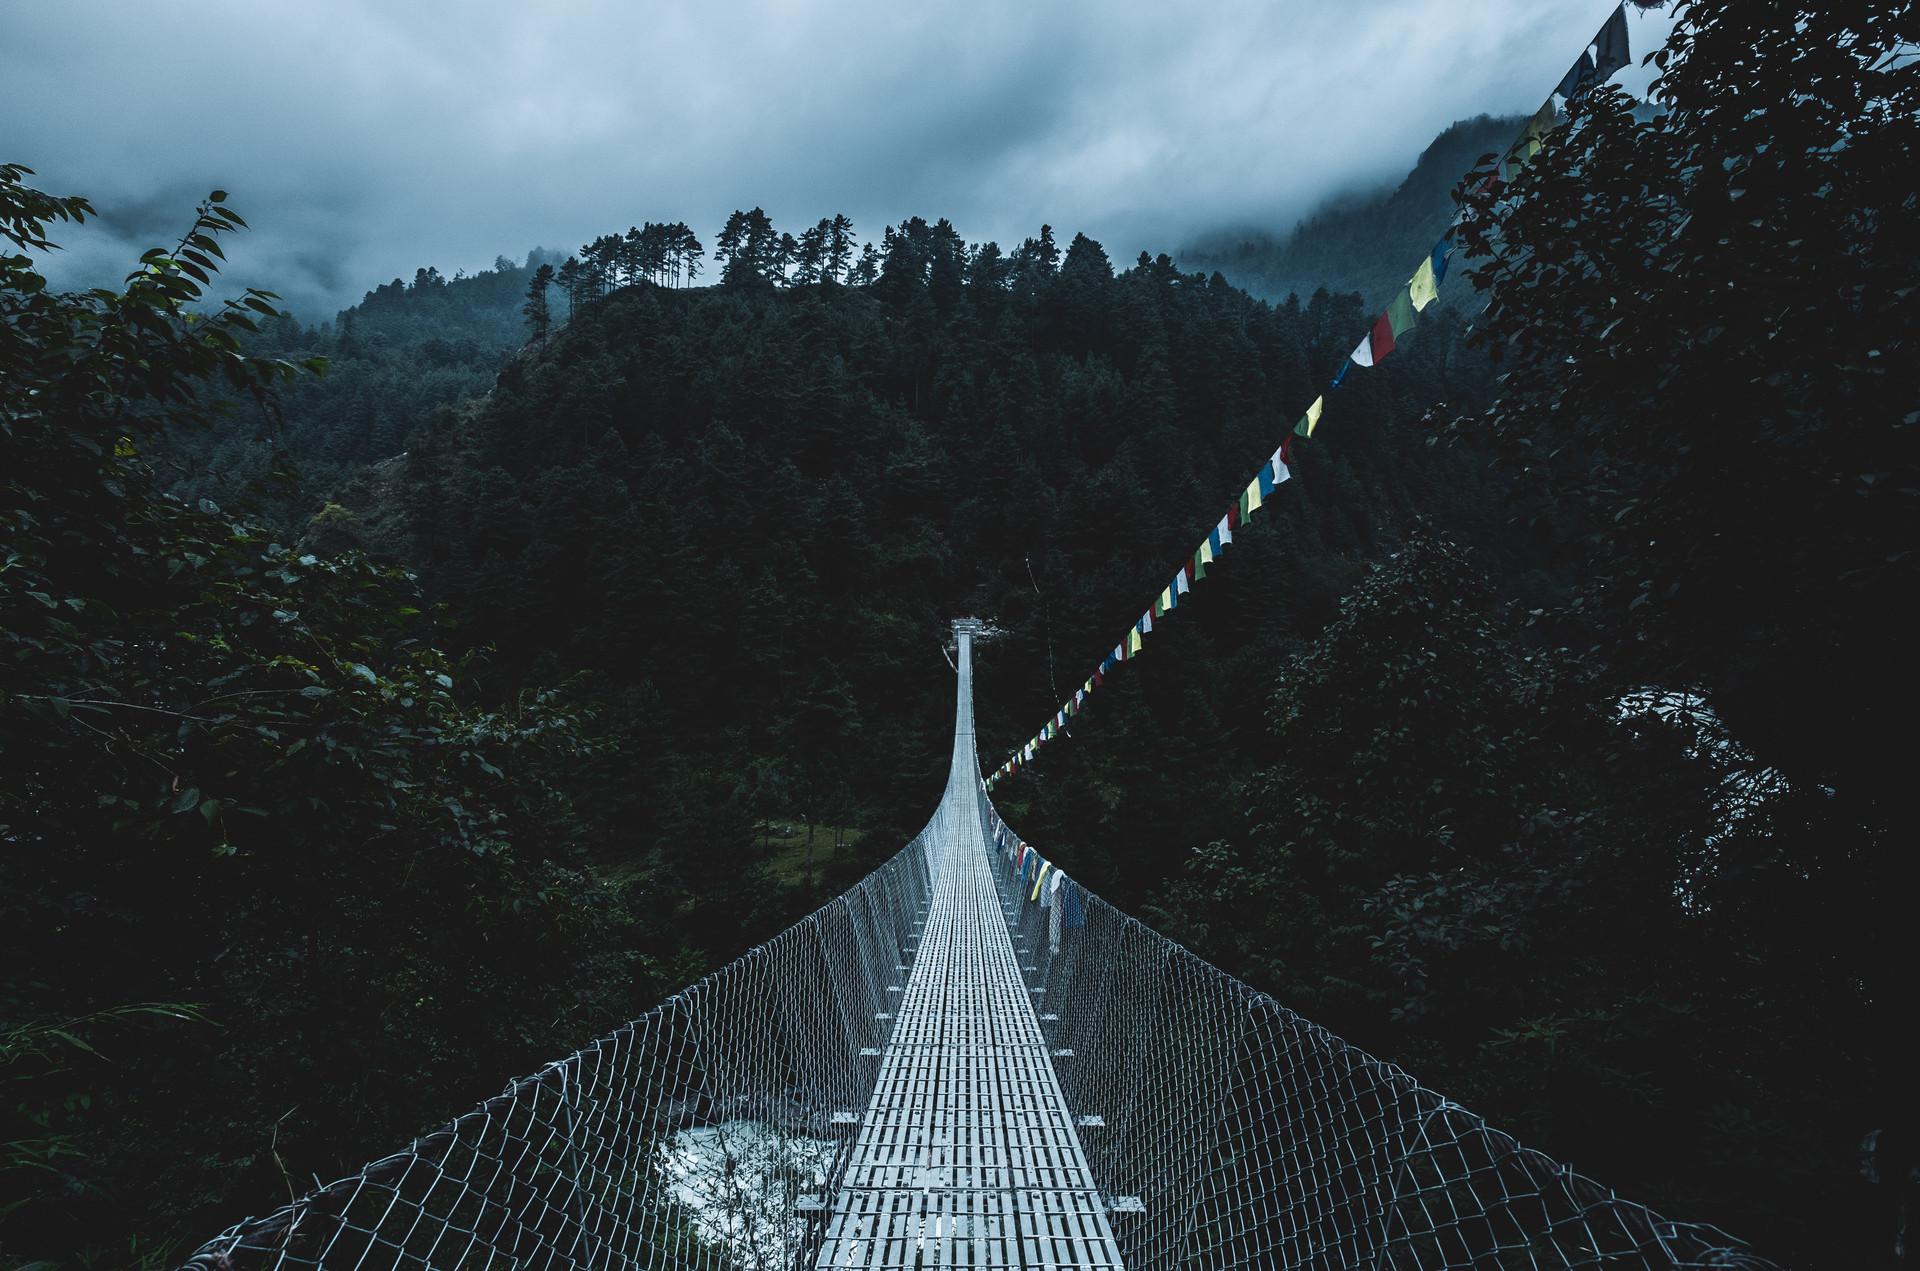 nepal_port-119587.jpg